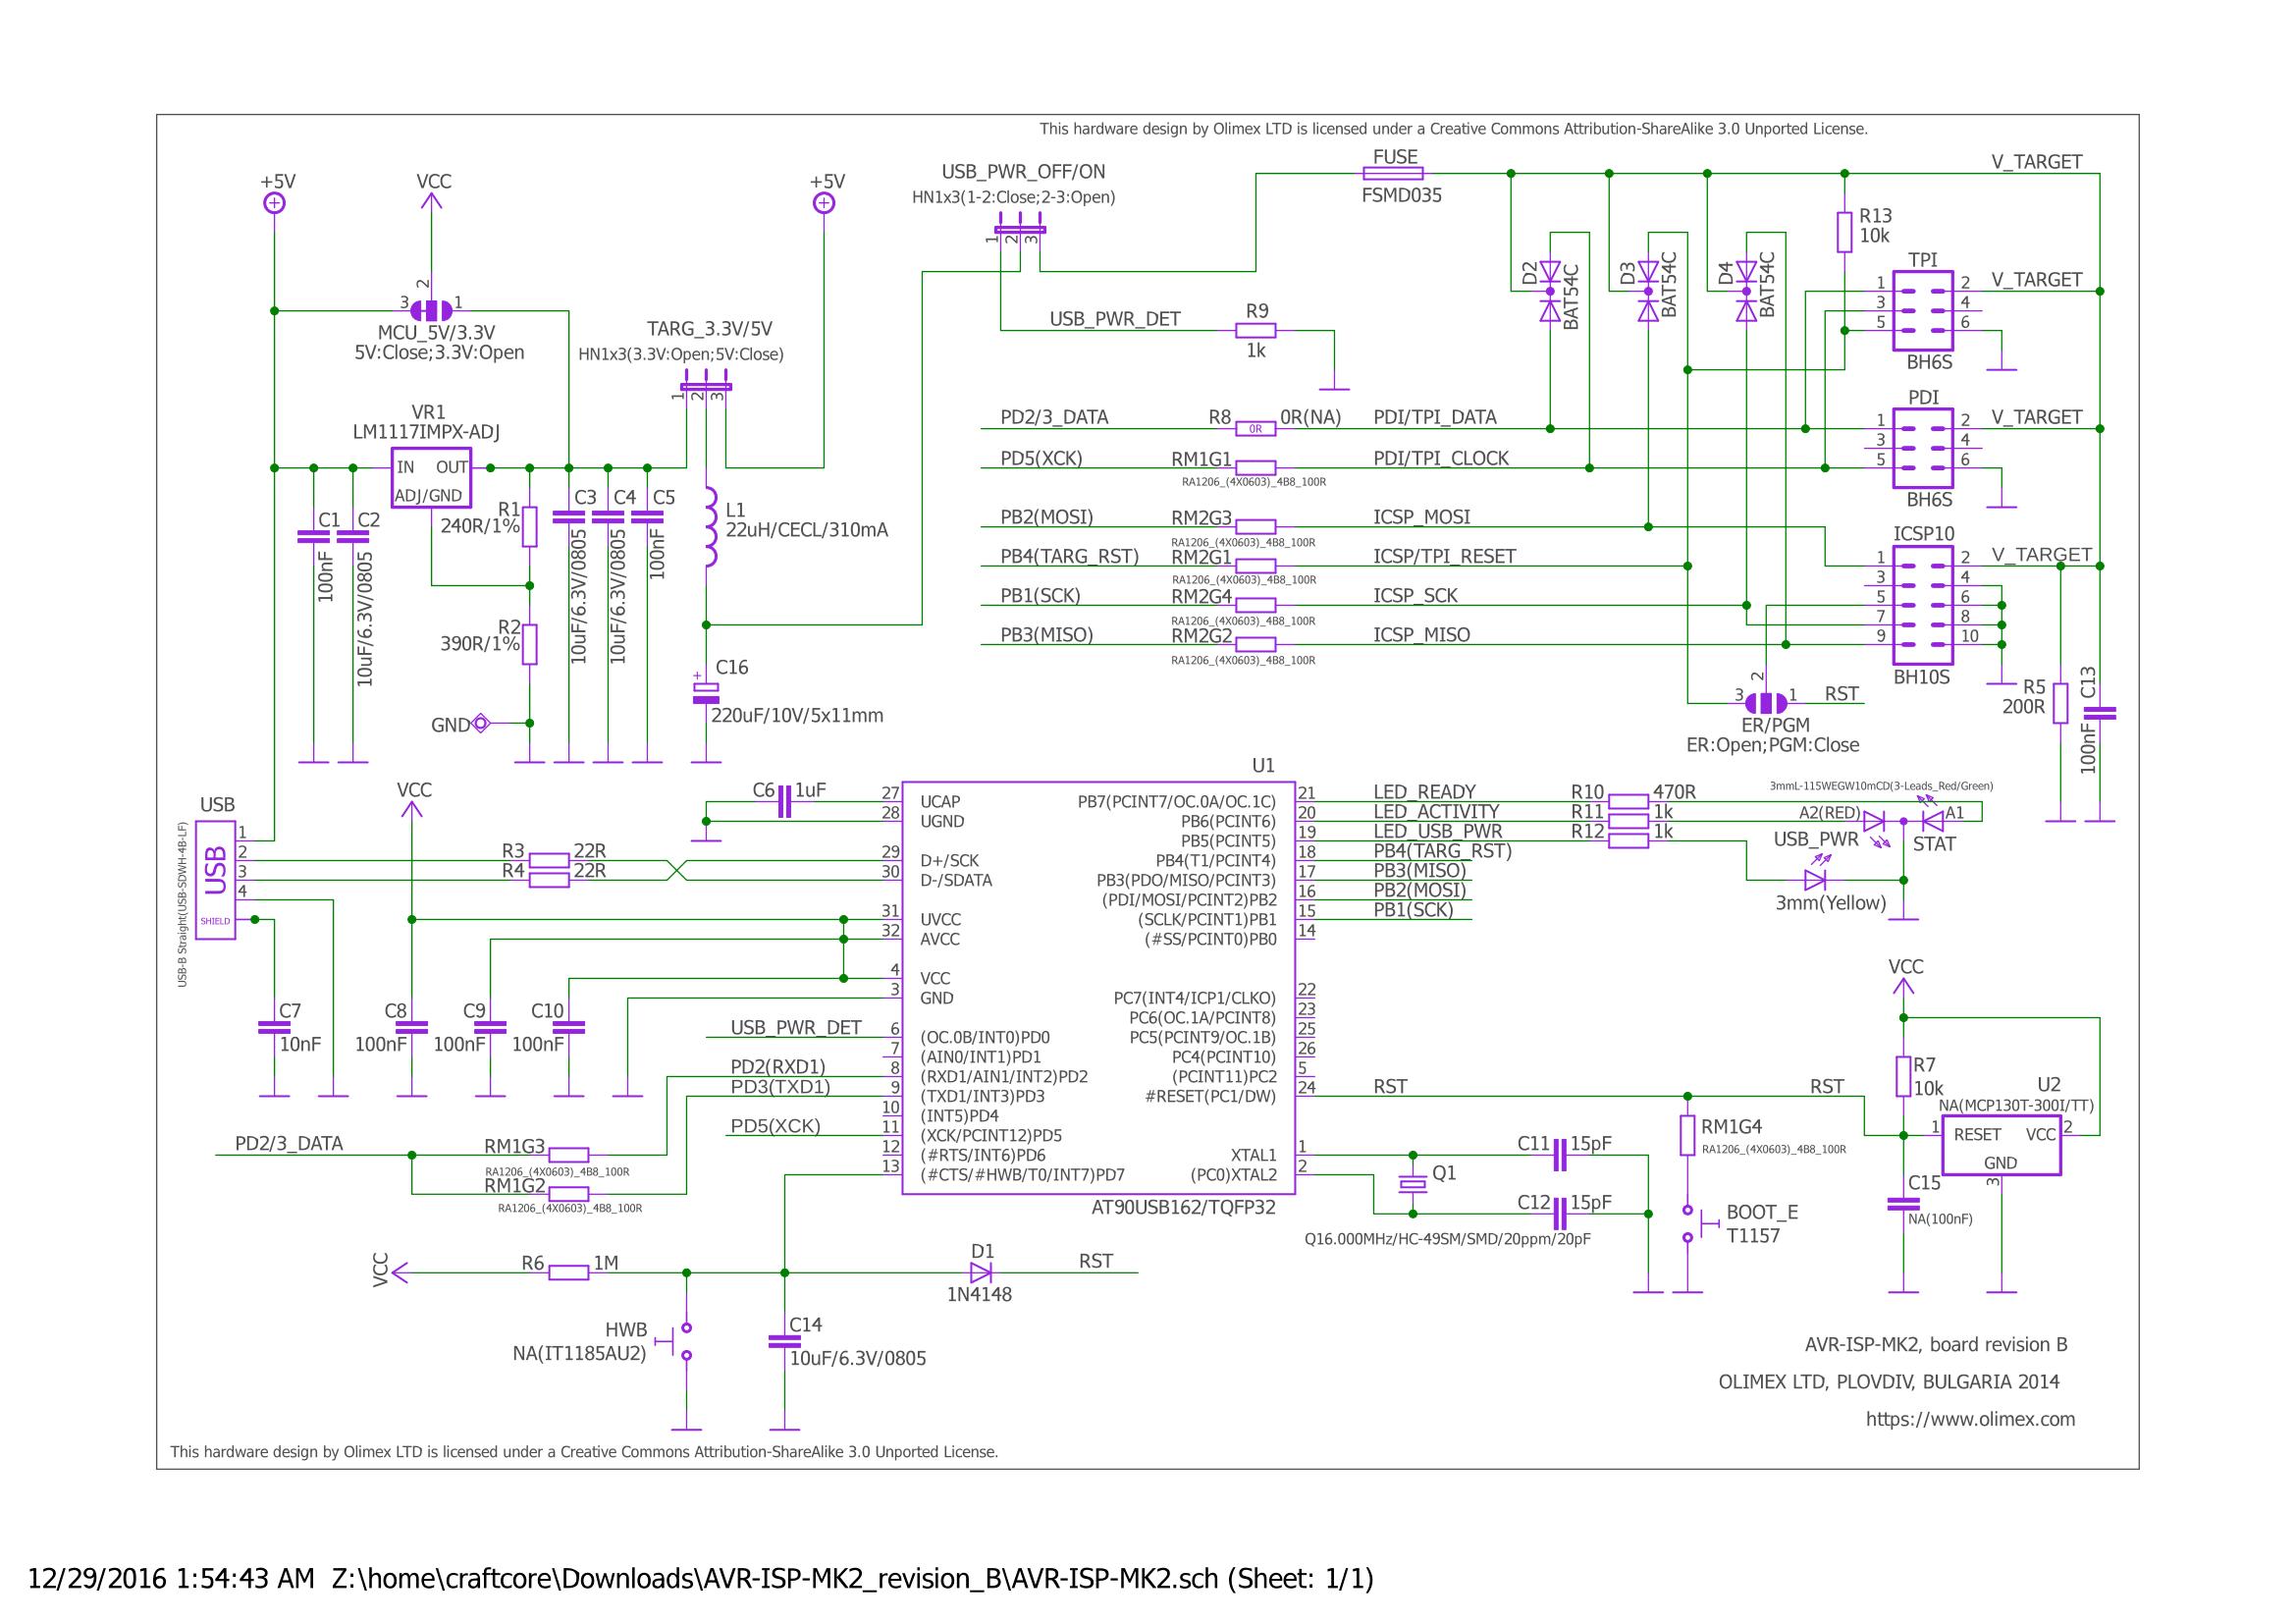 fragen zu schaltplan (AVR-ISP-MK2-klon) - Mikrocontroller.net